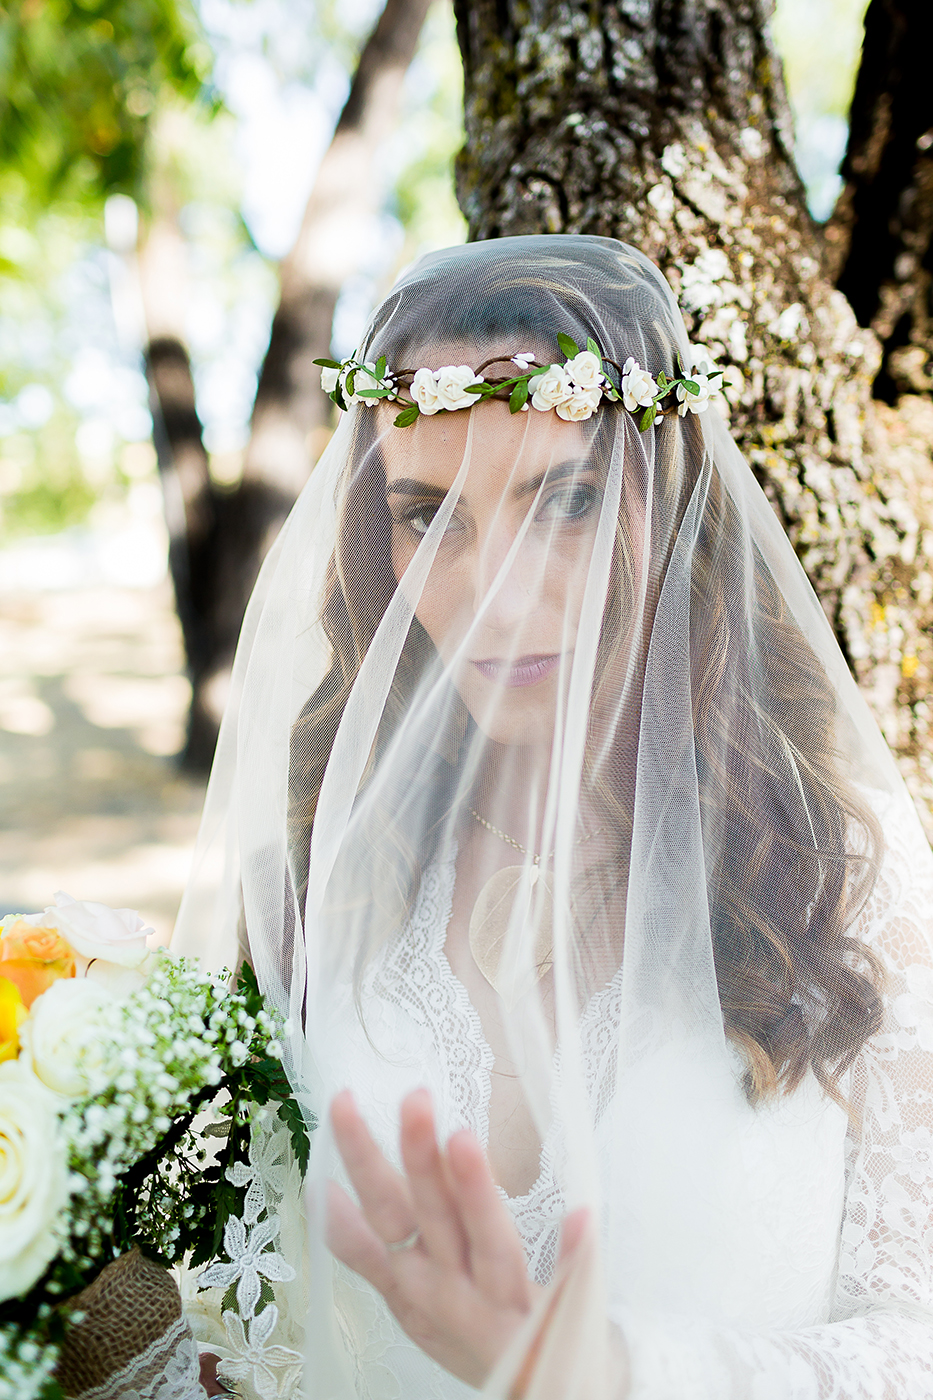 Push the veil bride Zoart Photography